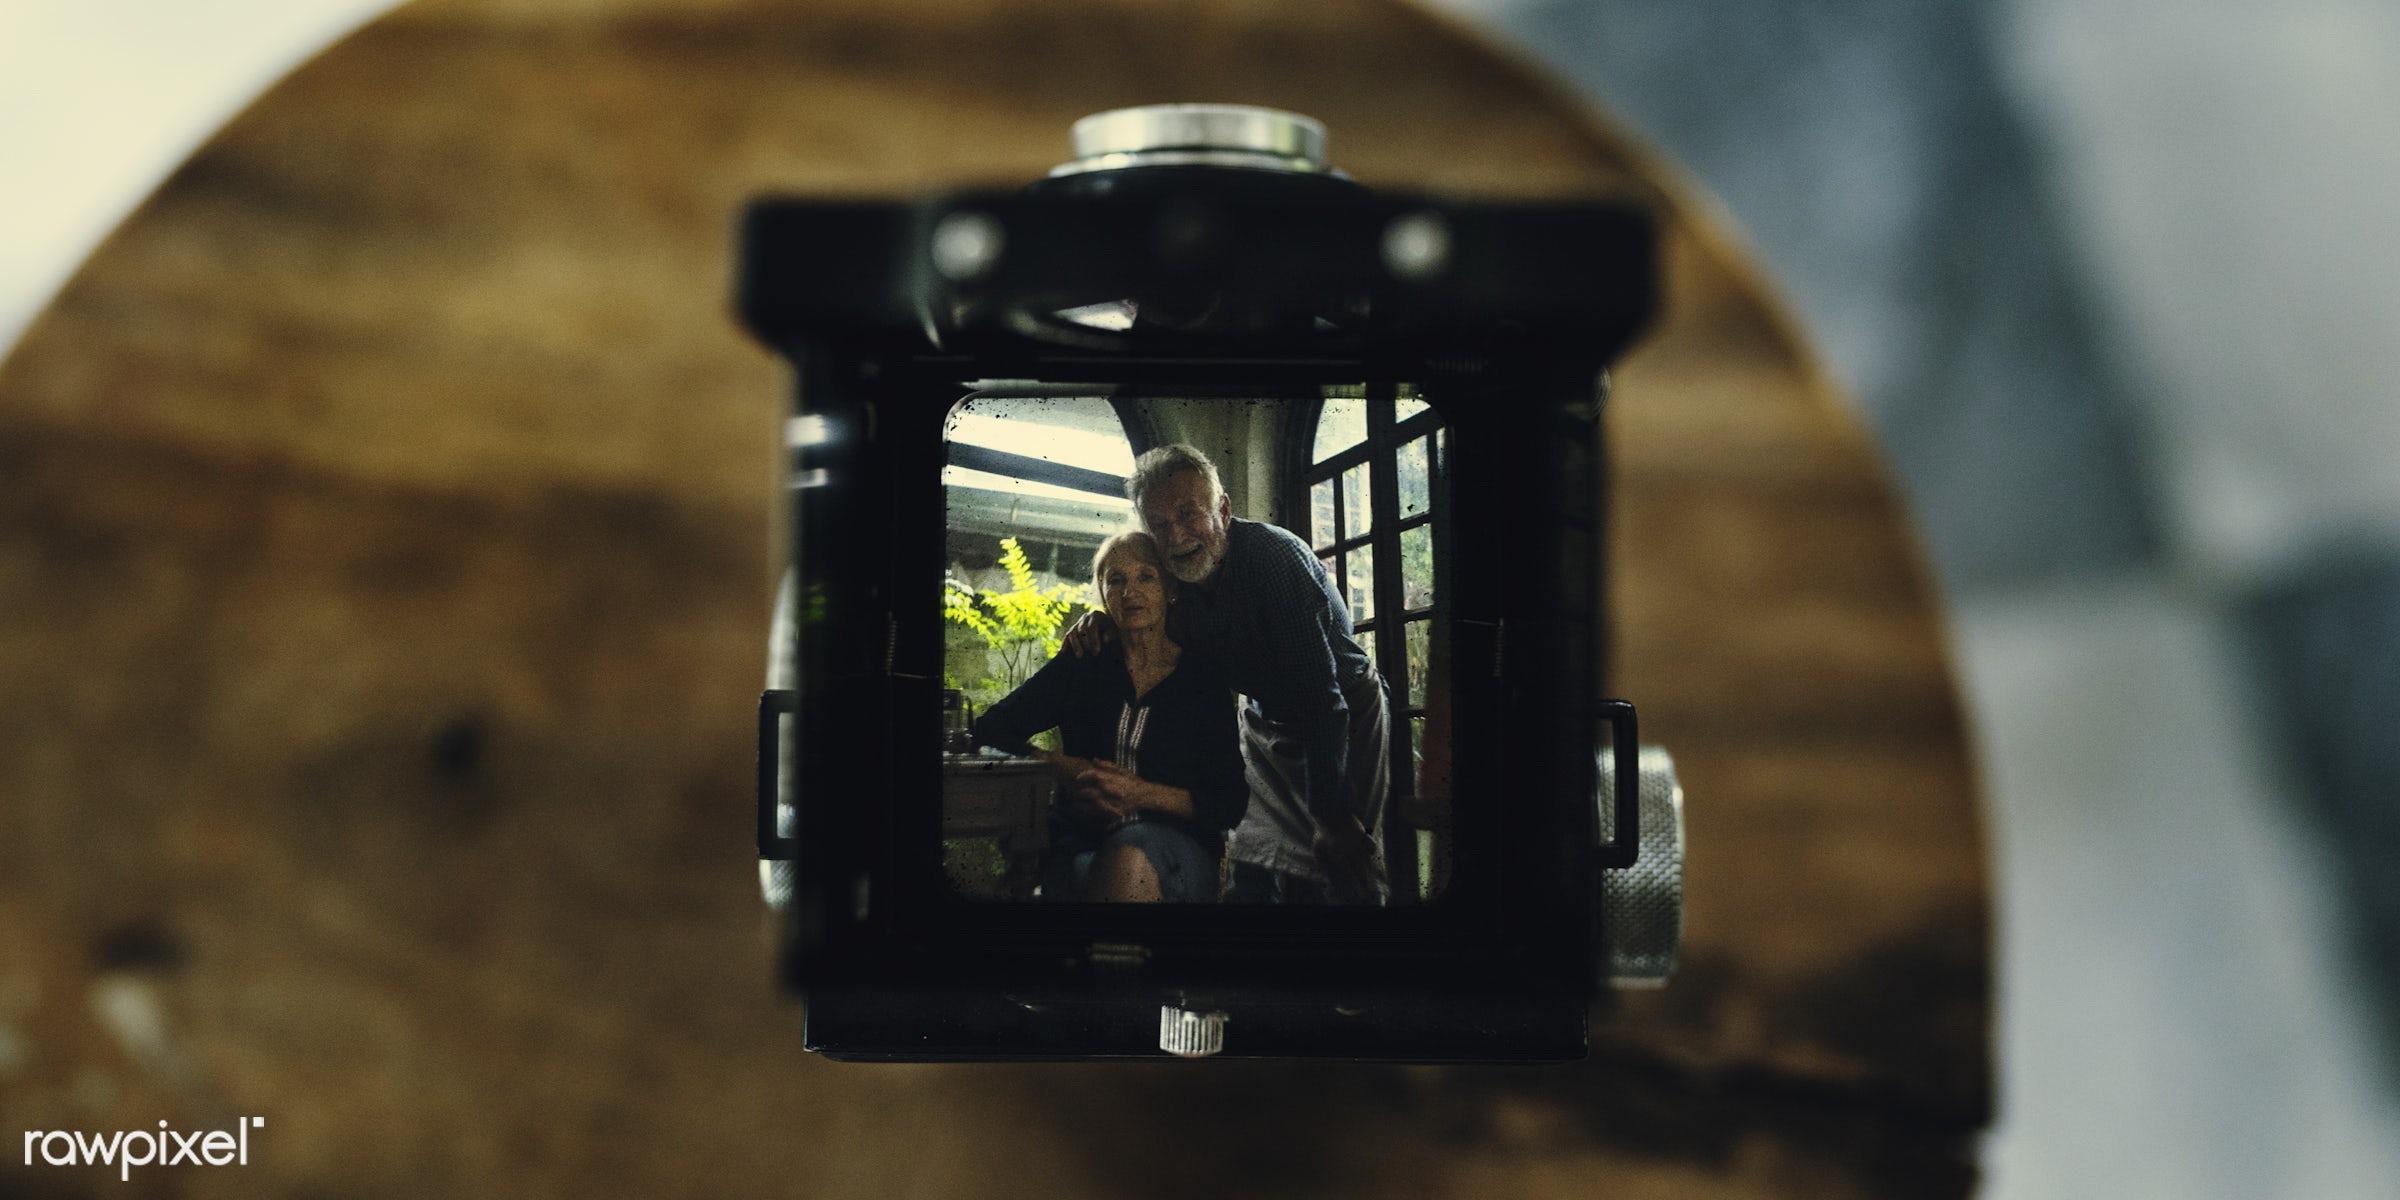 film, vintage, camera, hobby, retro, leisure, photography, hands, photographer, classic, closeup